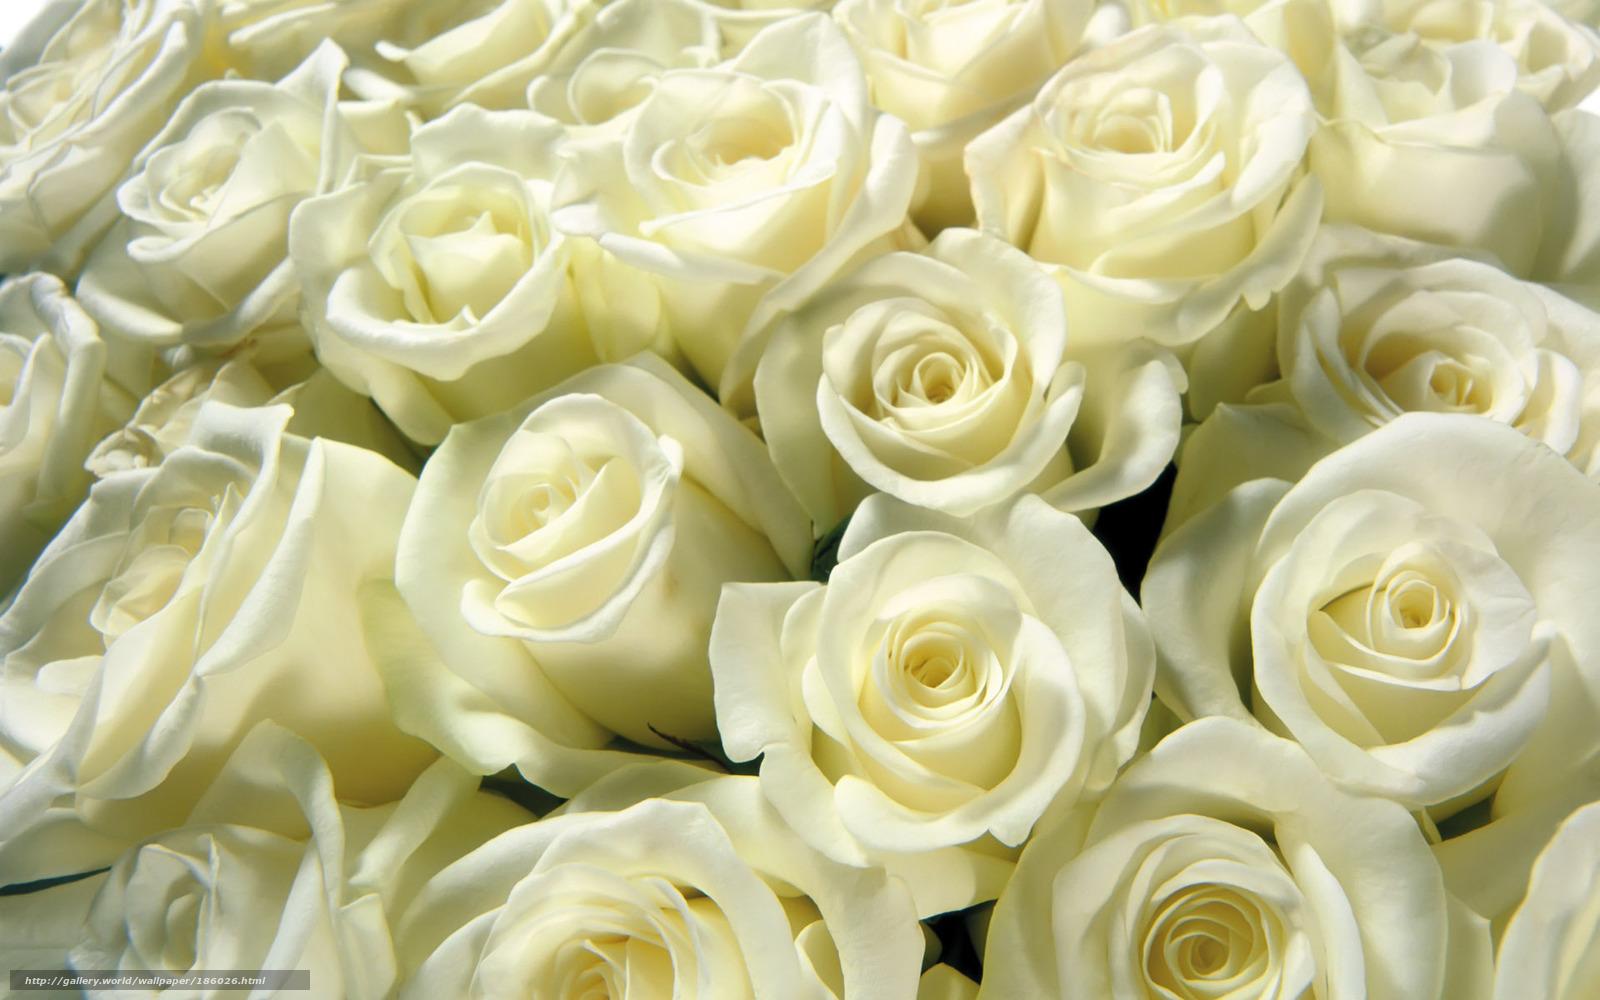 Hq картинка букет белые розы бутоны